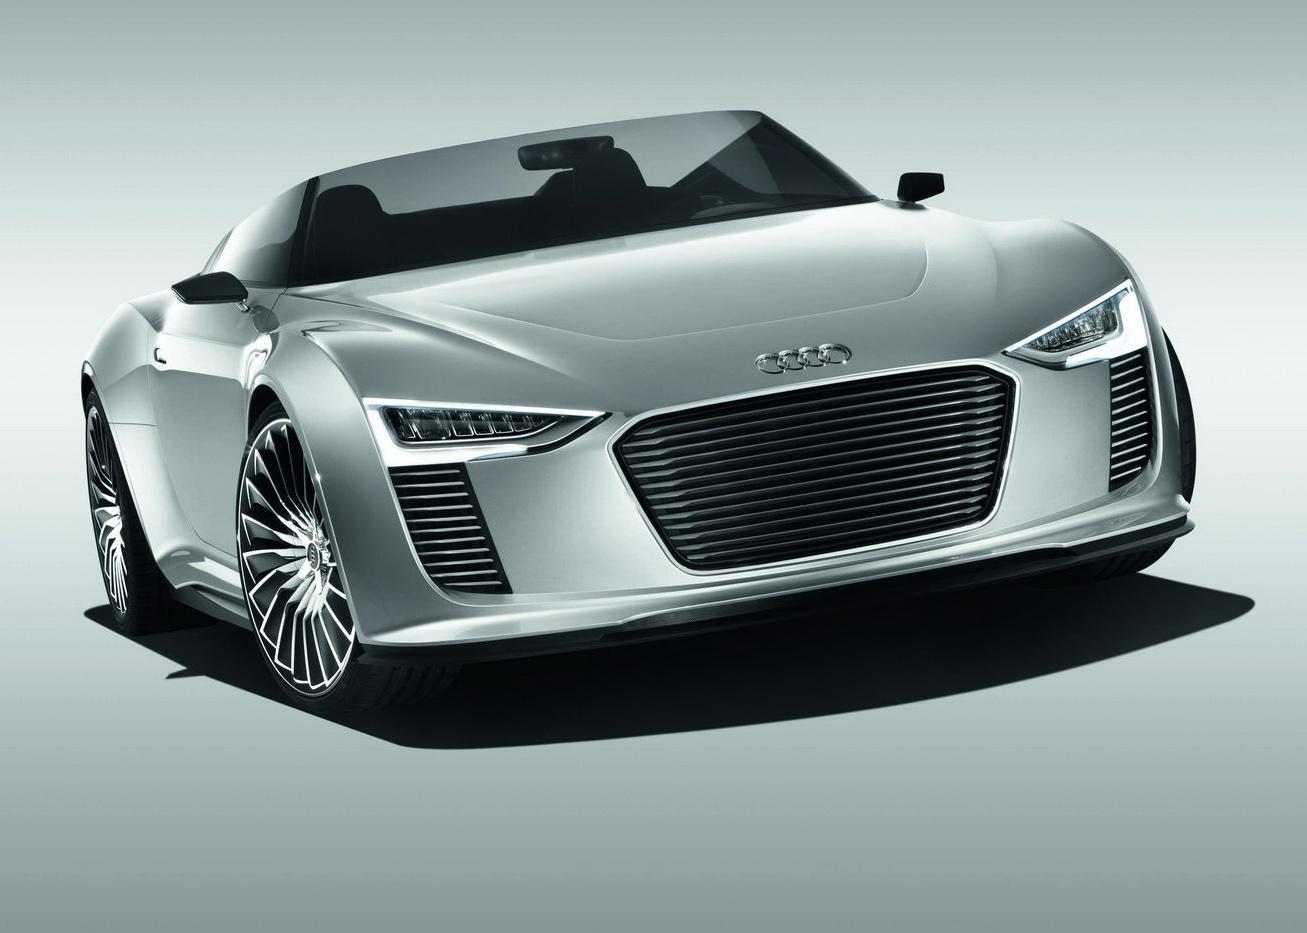 Audi Considering Third Sports Car Line: Report